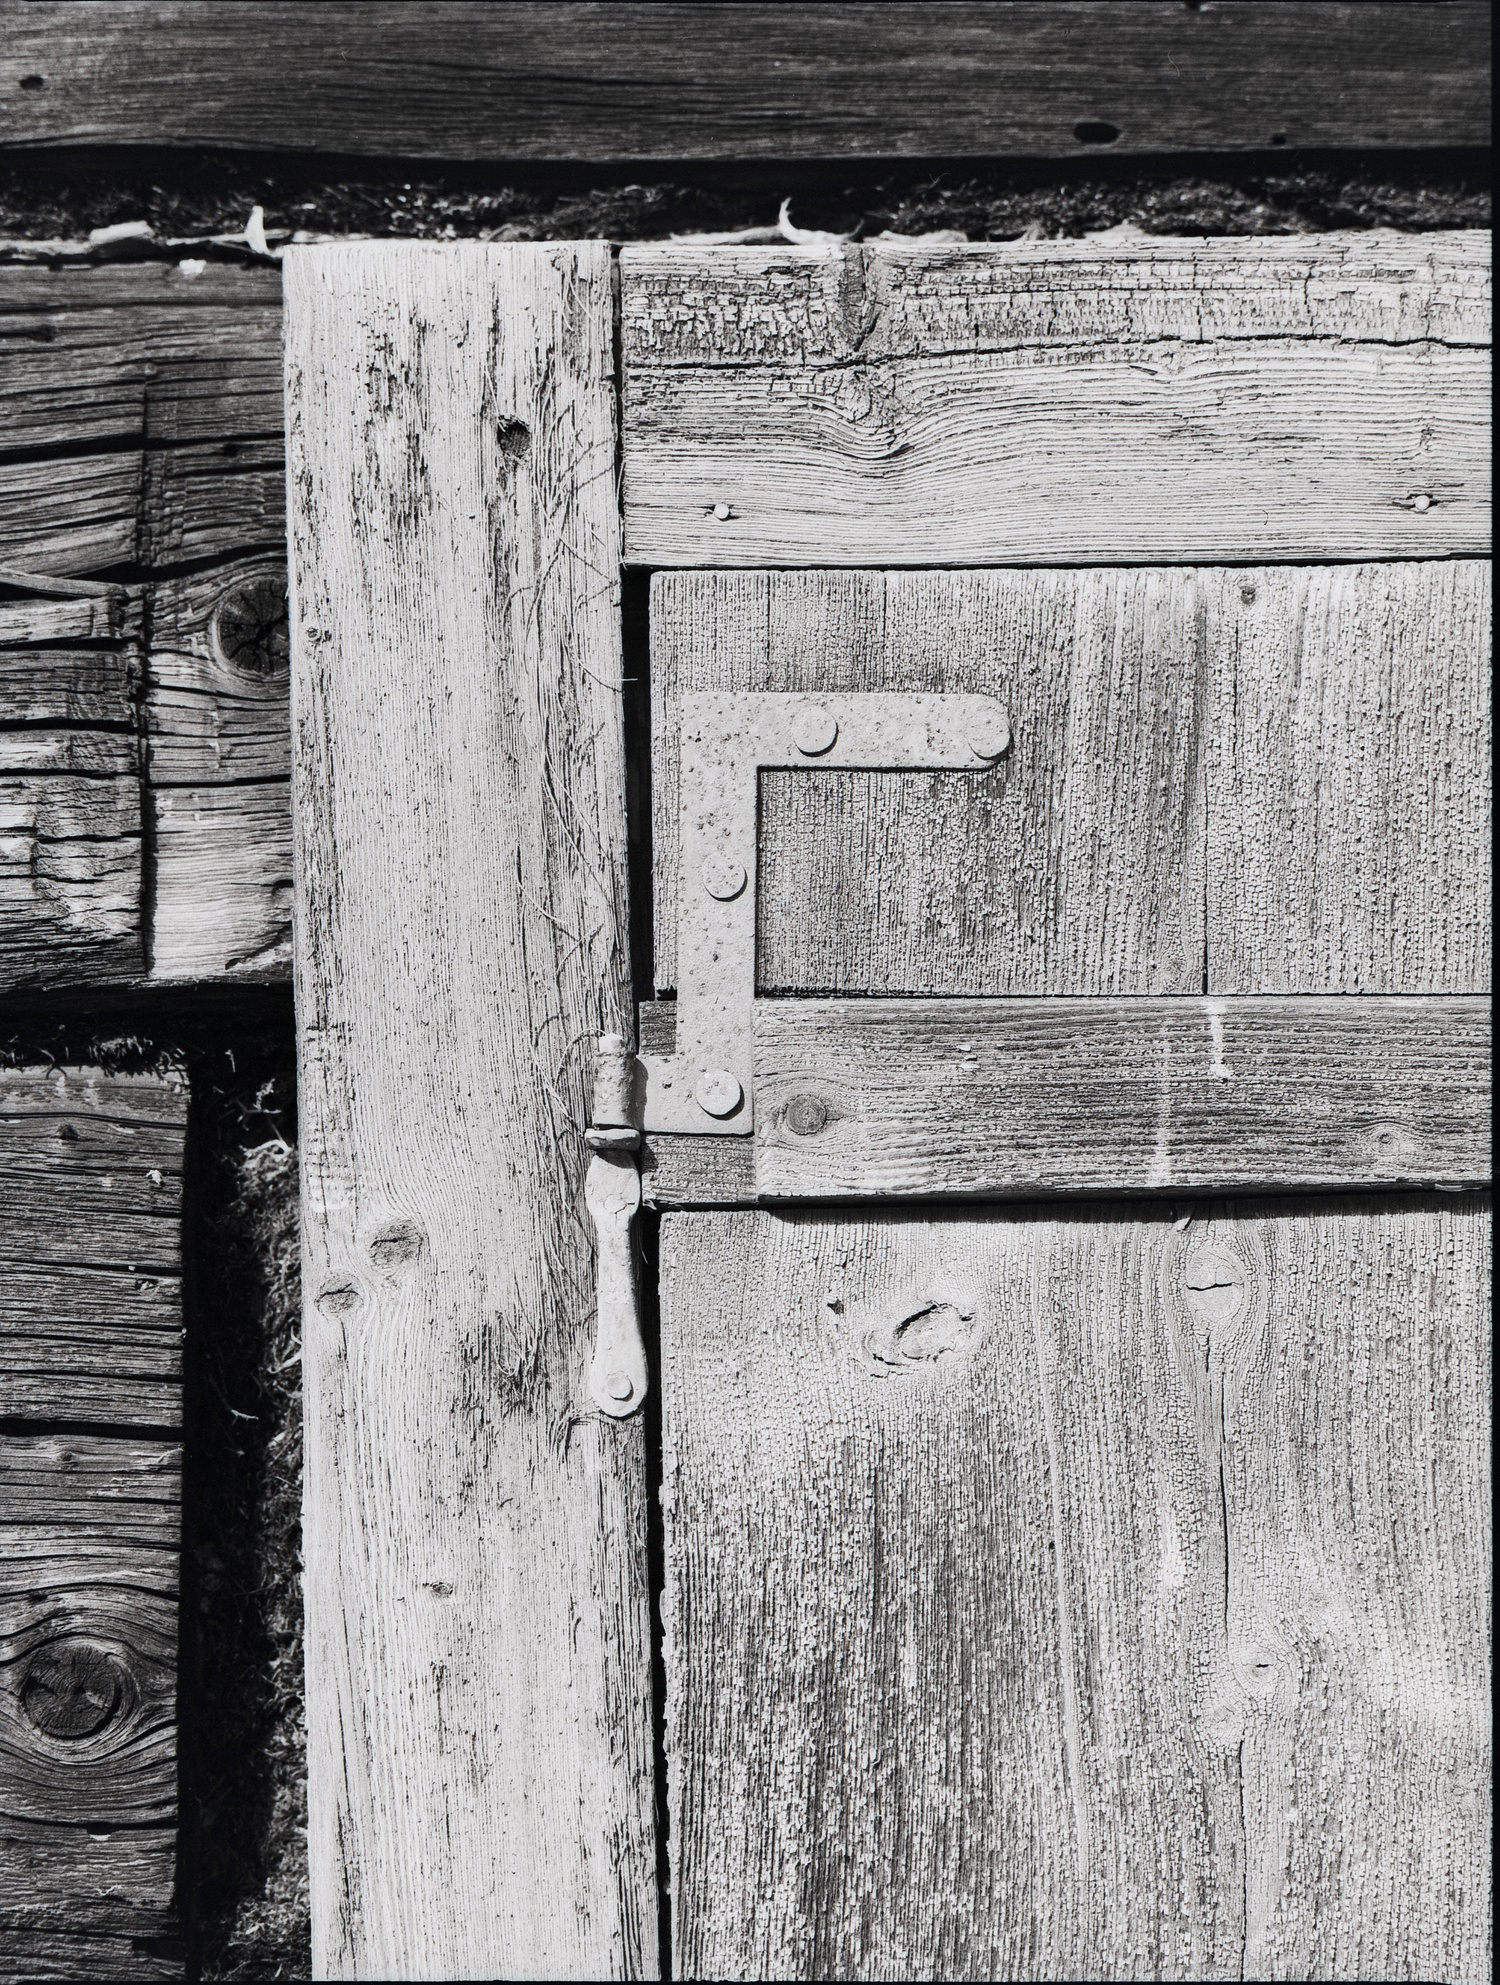 #077 Farmhouse Window Details #1 - Untertal